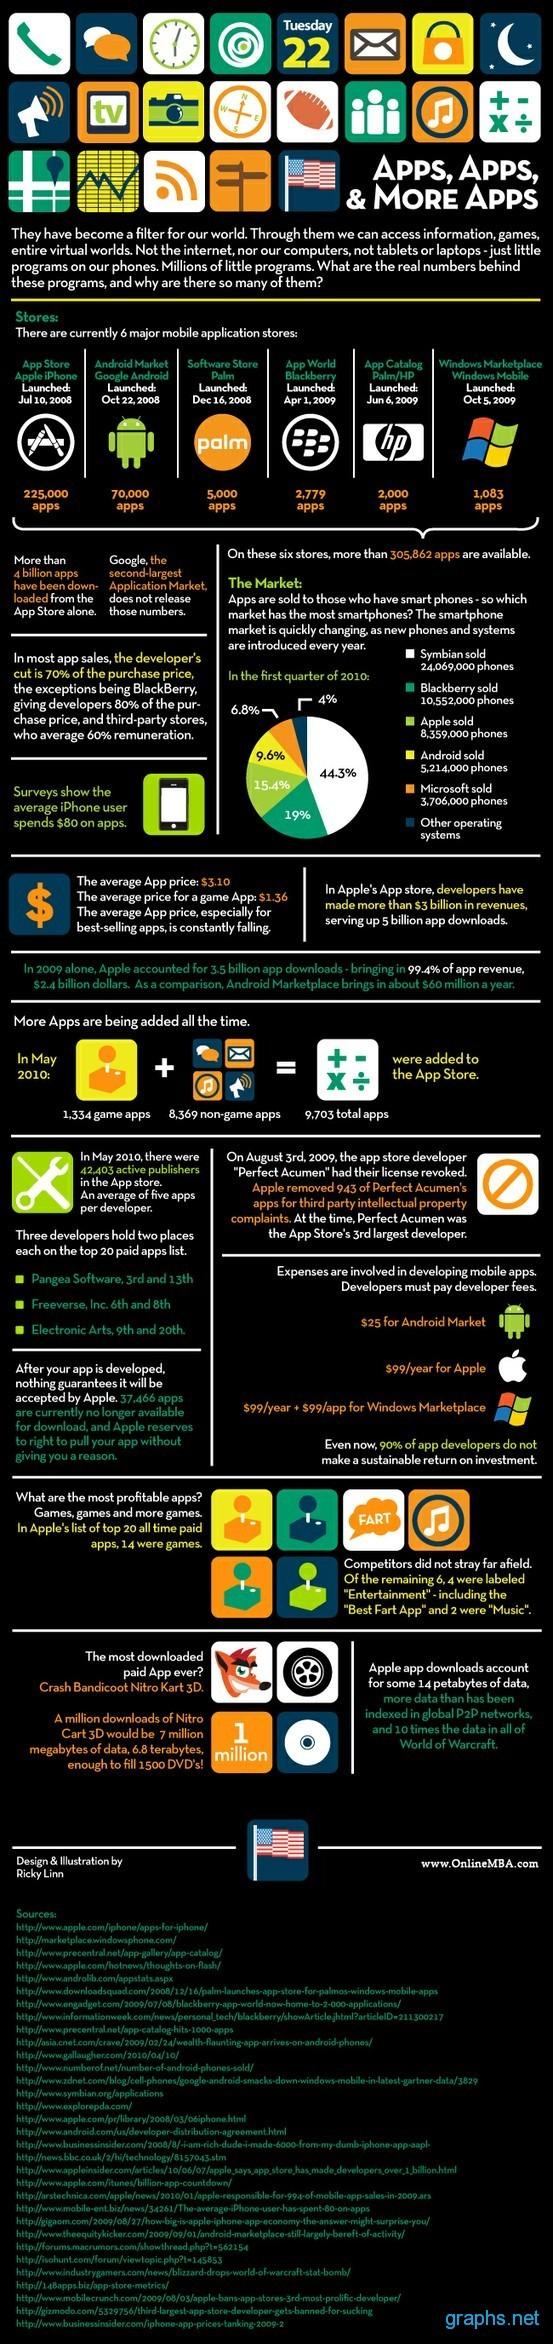 Market Data Mobile Applications